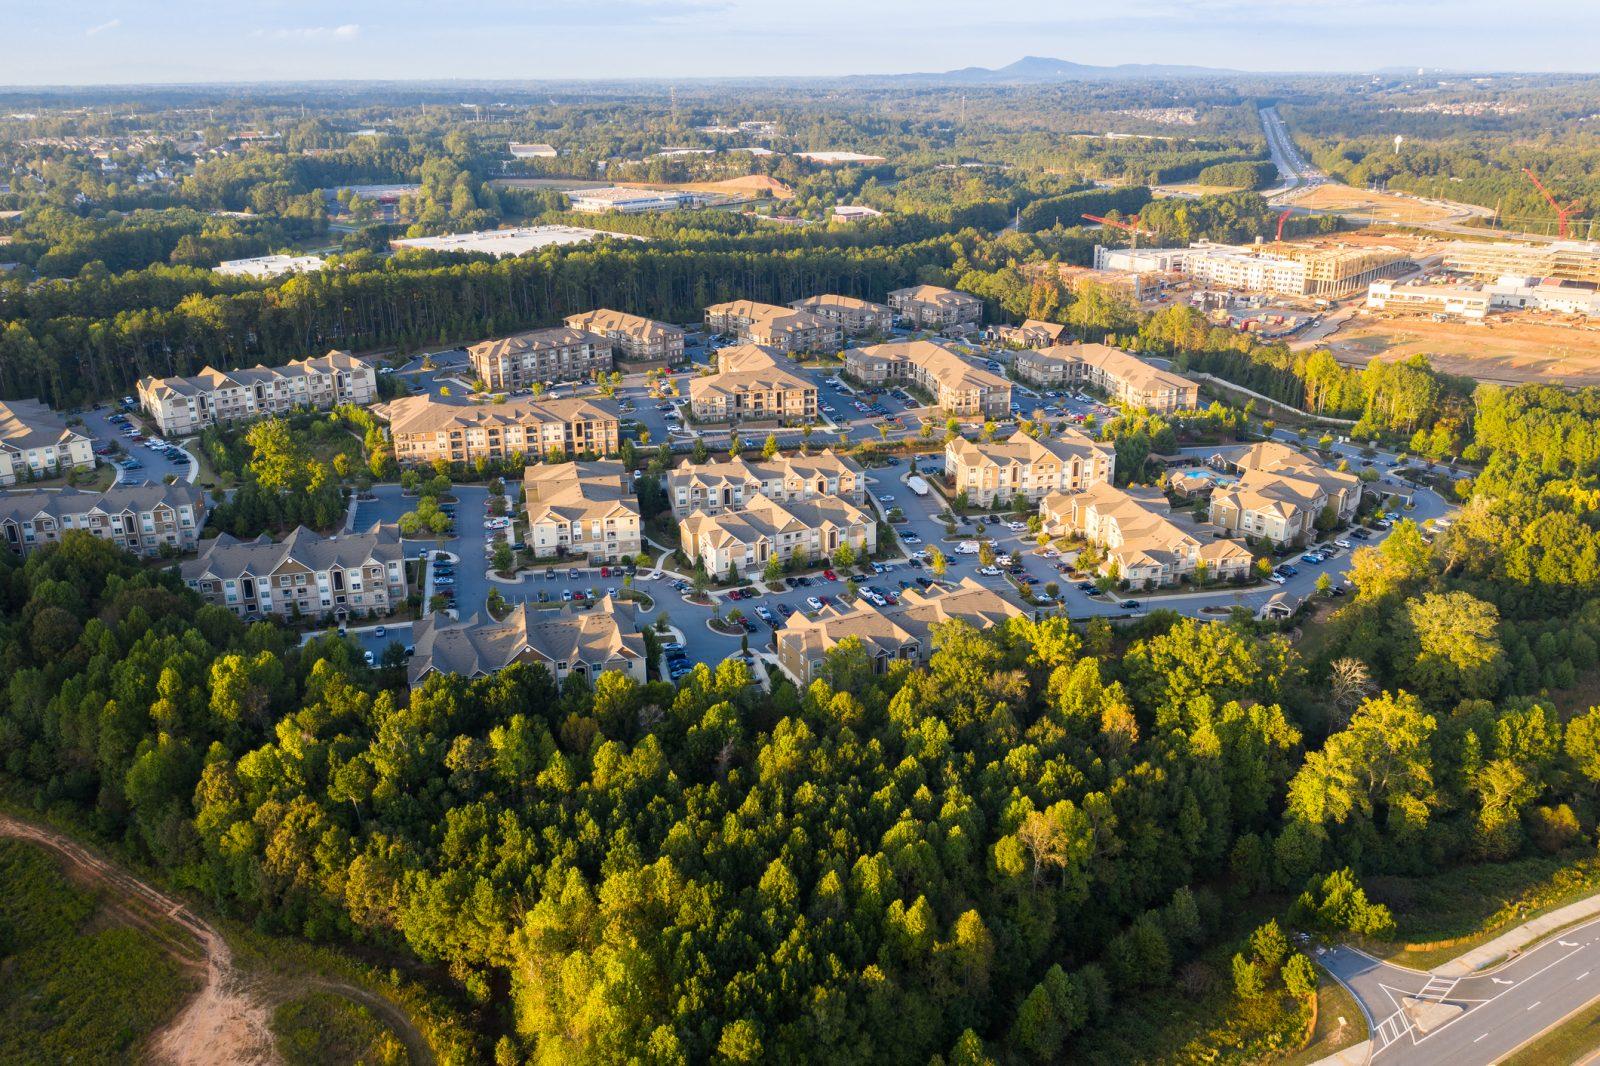 Aerial view of suburban communities in downtown alpharetta georgia